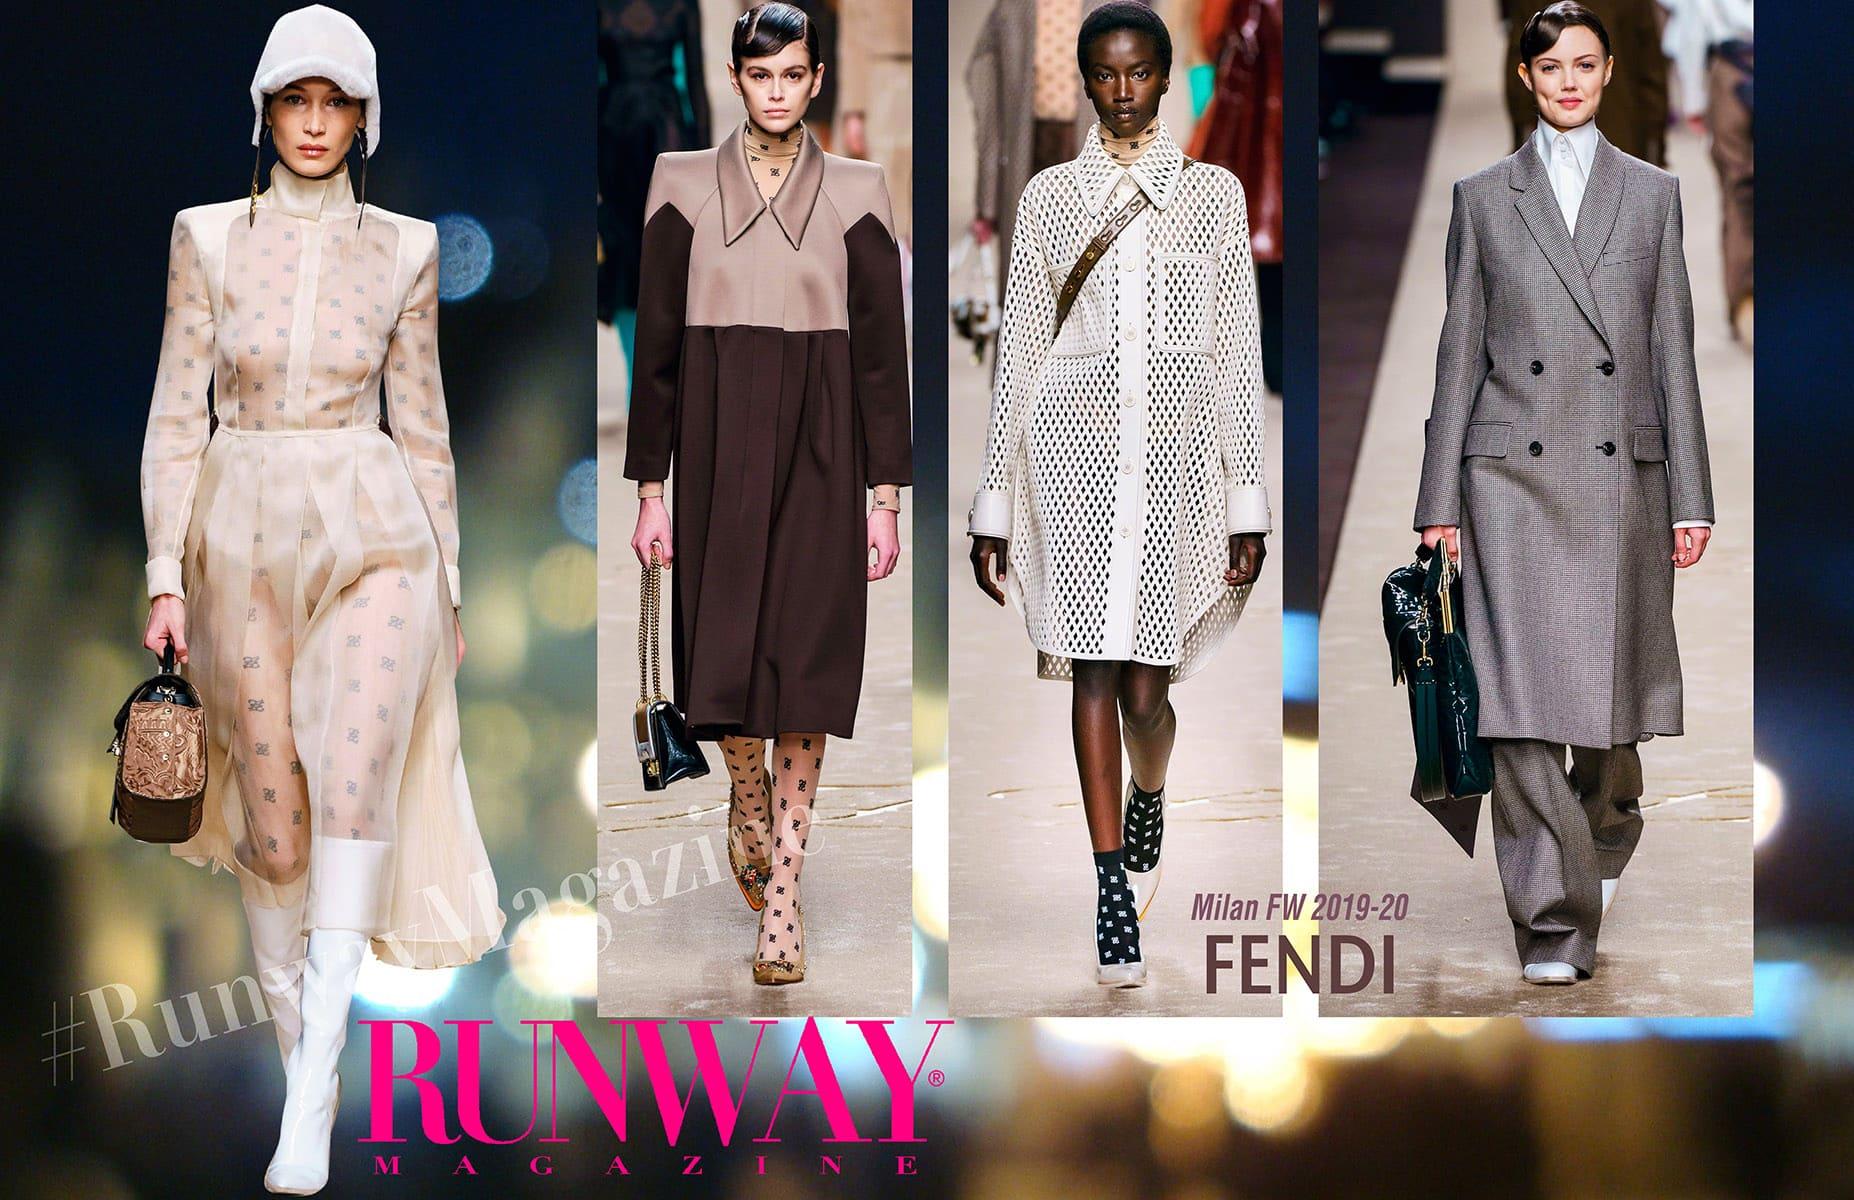 Fendi fall-Winter 2019-2020 Milan Fashion Week by RUNWAY MAGAZINE